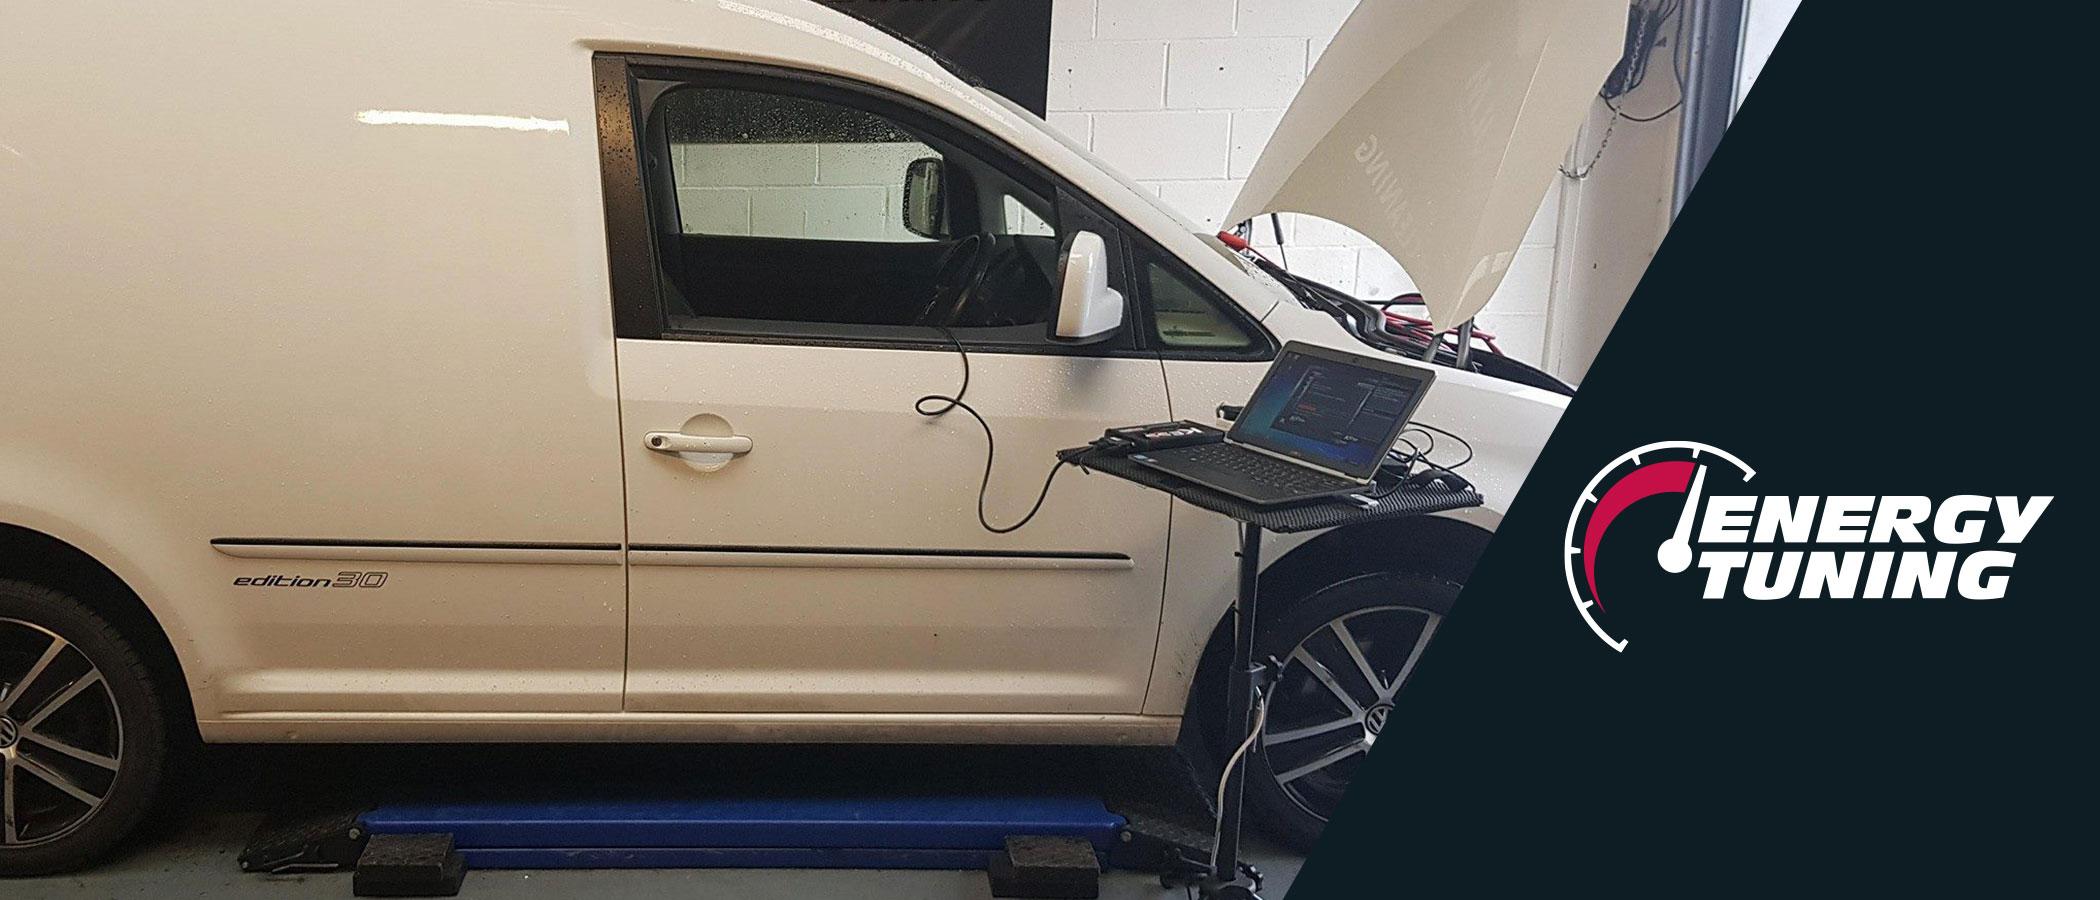 VW Caddy 2.0 TDI 140 stage 1 remap